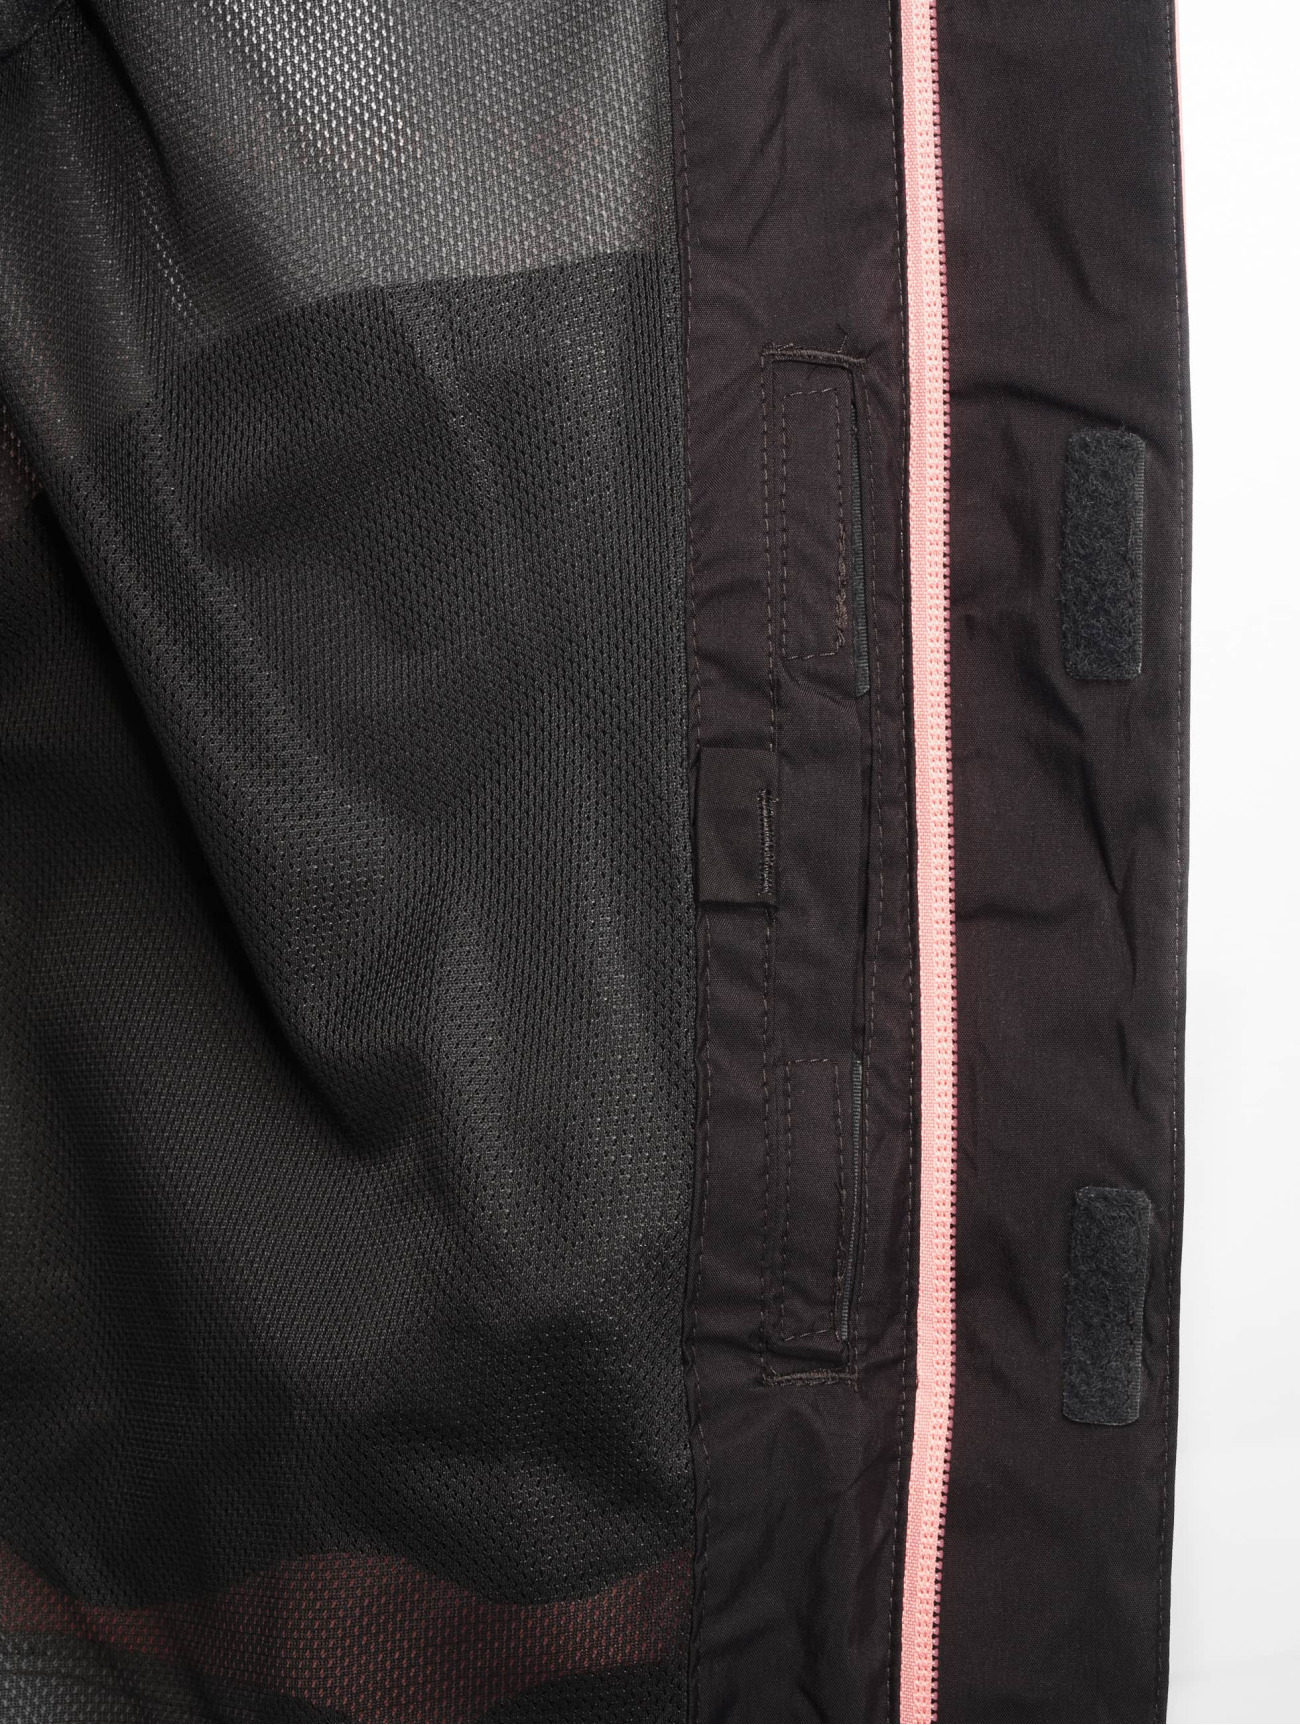 Columbia Jacket / Lightweight Jacket Windell Park in rose 631259